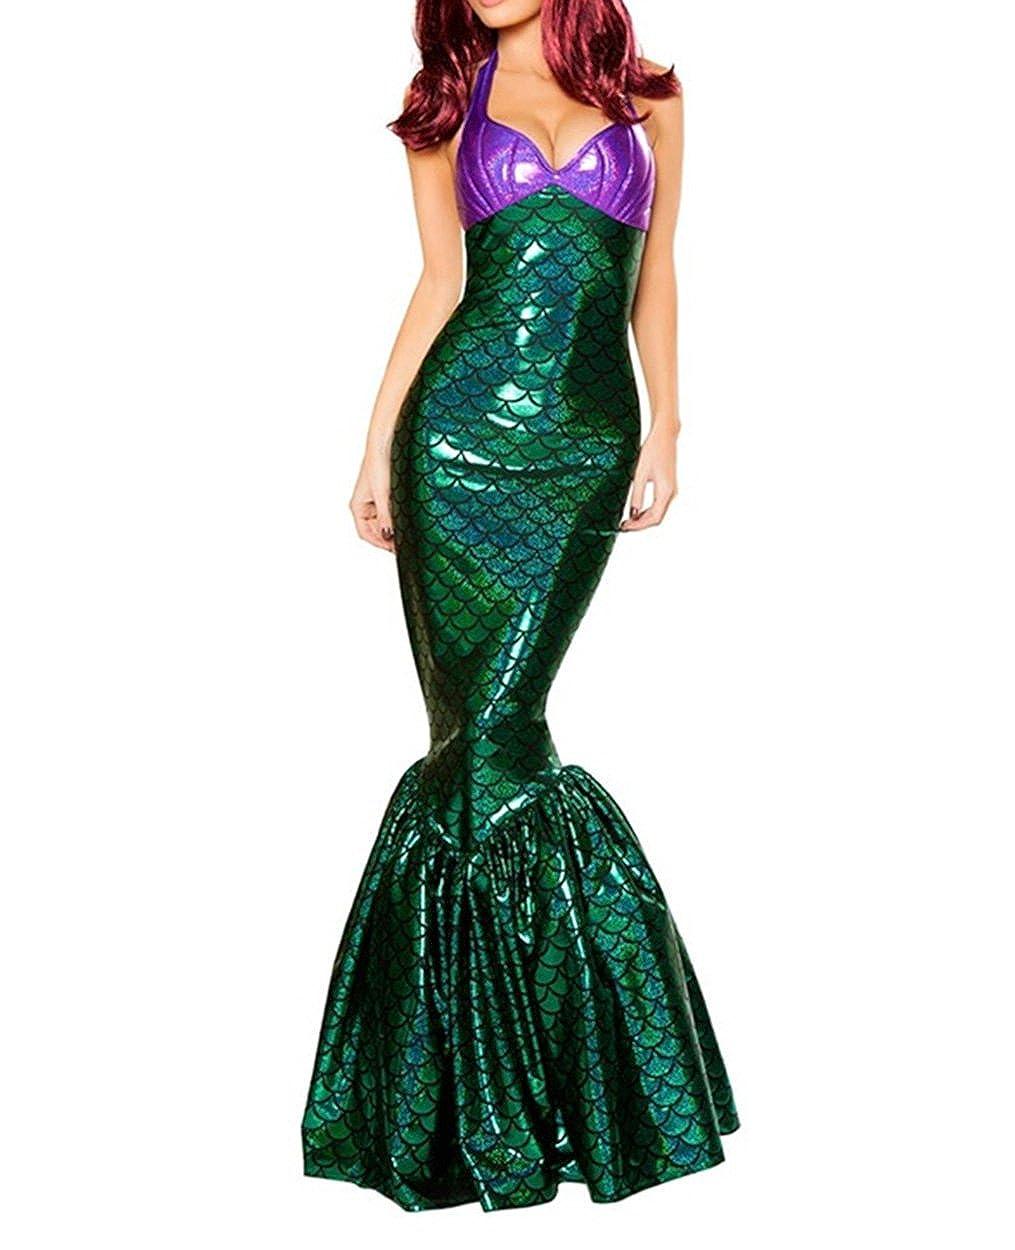 XSHUN Women 2018 New Halloween Deluxe Mermaid Costumes Halloween Paty Cosplay Mermaid